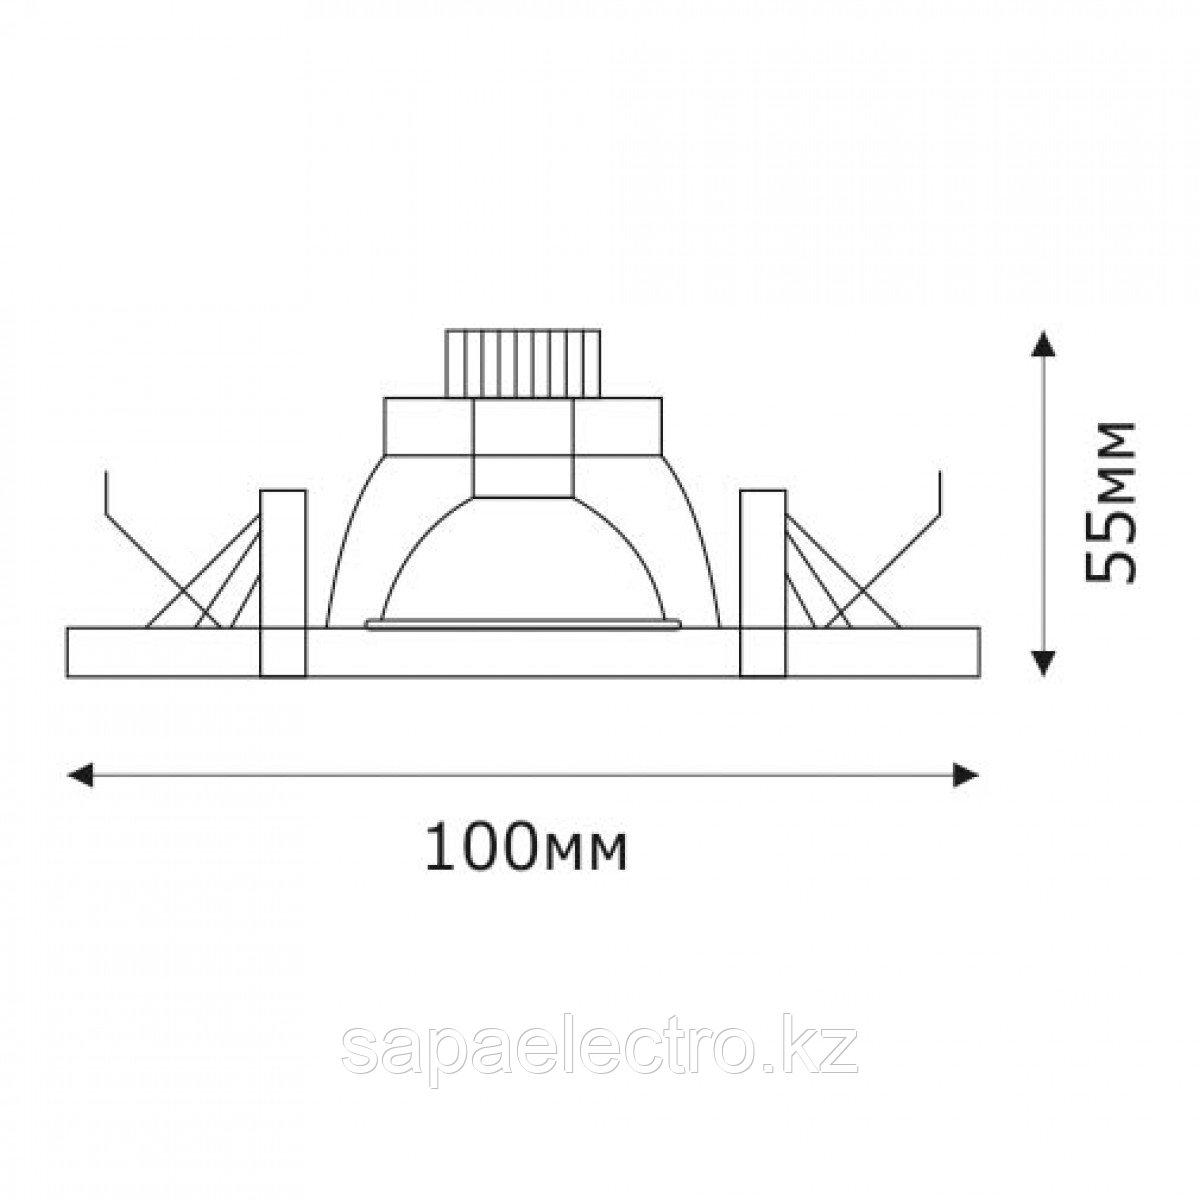 Спот LED JL-SPD-PET-2-W-R ROUND 3W 5000K (TS) 60шт